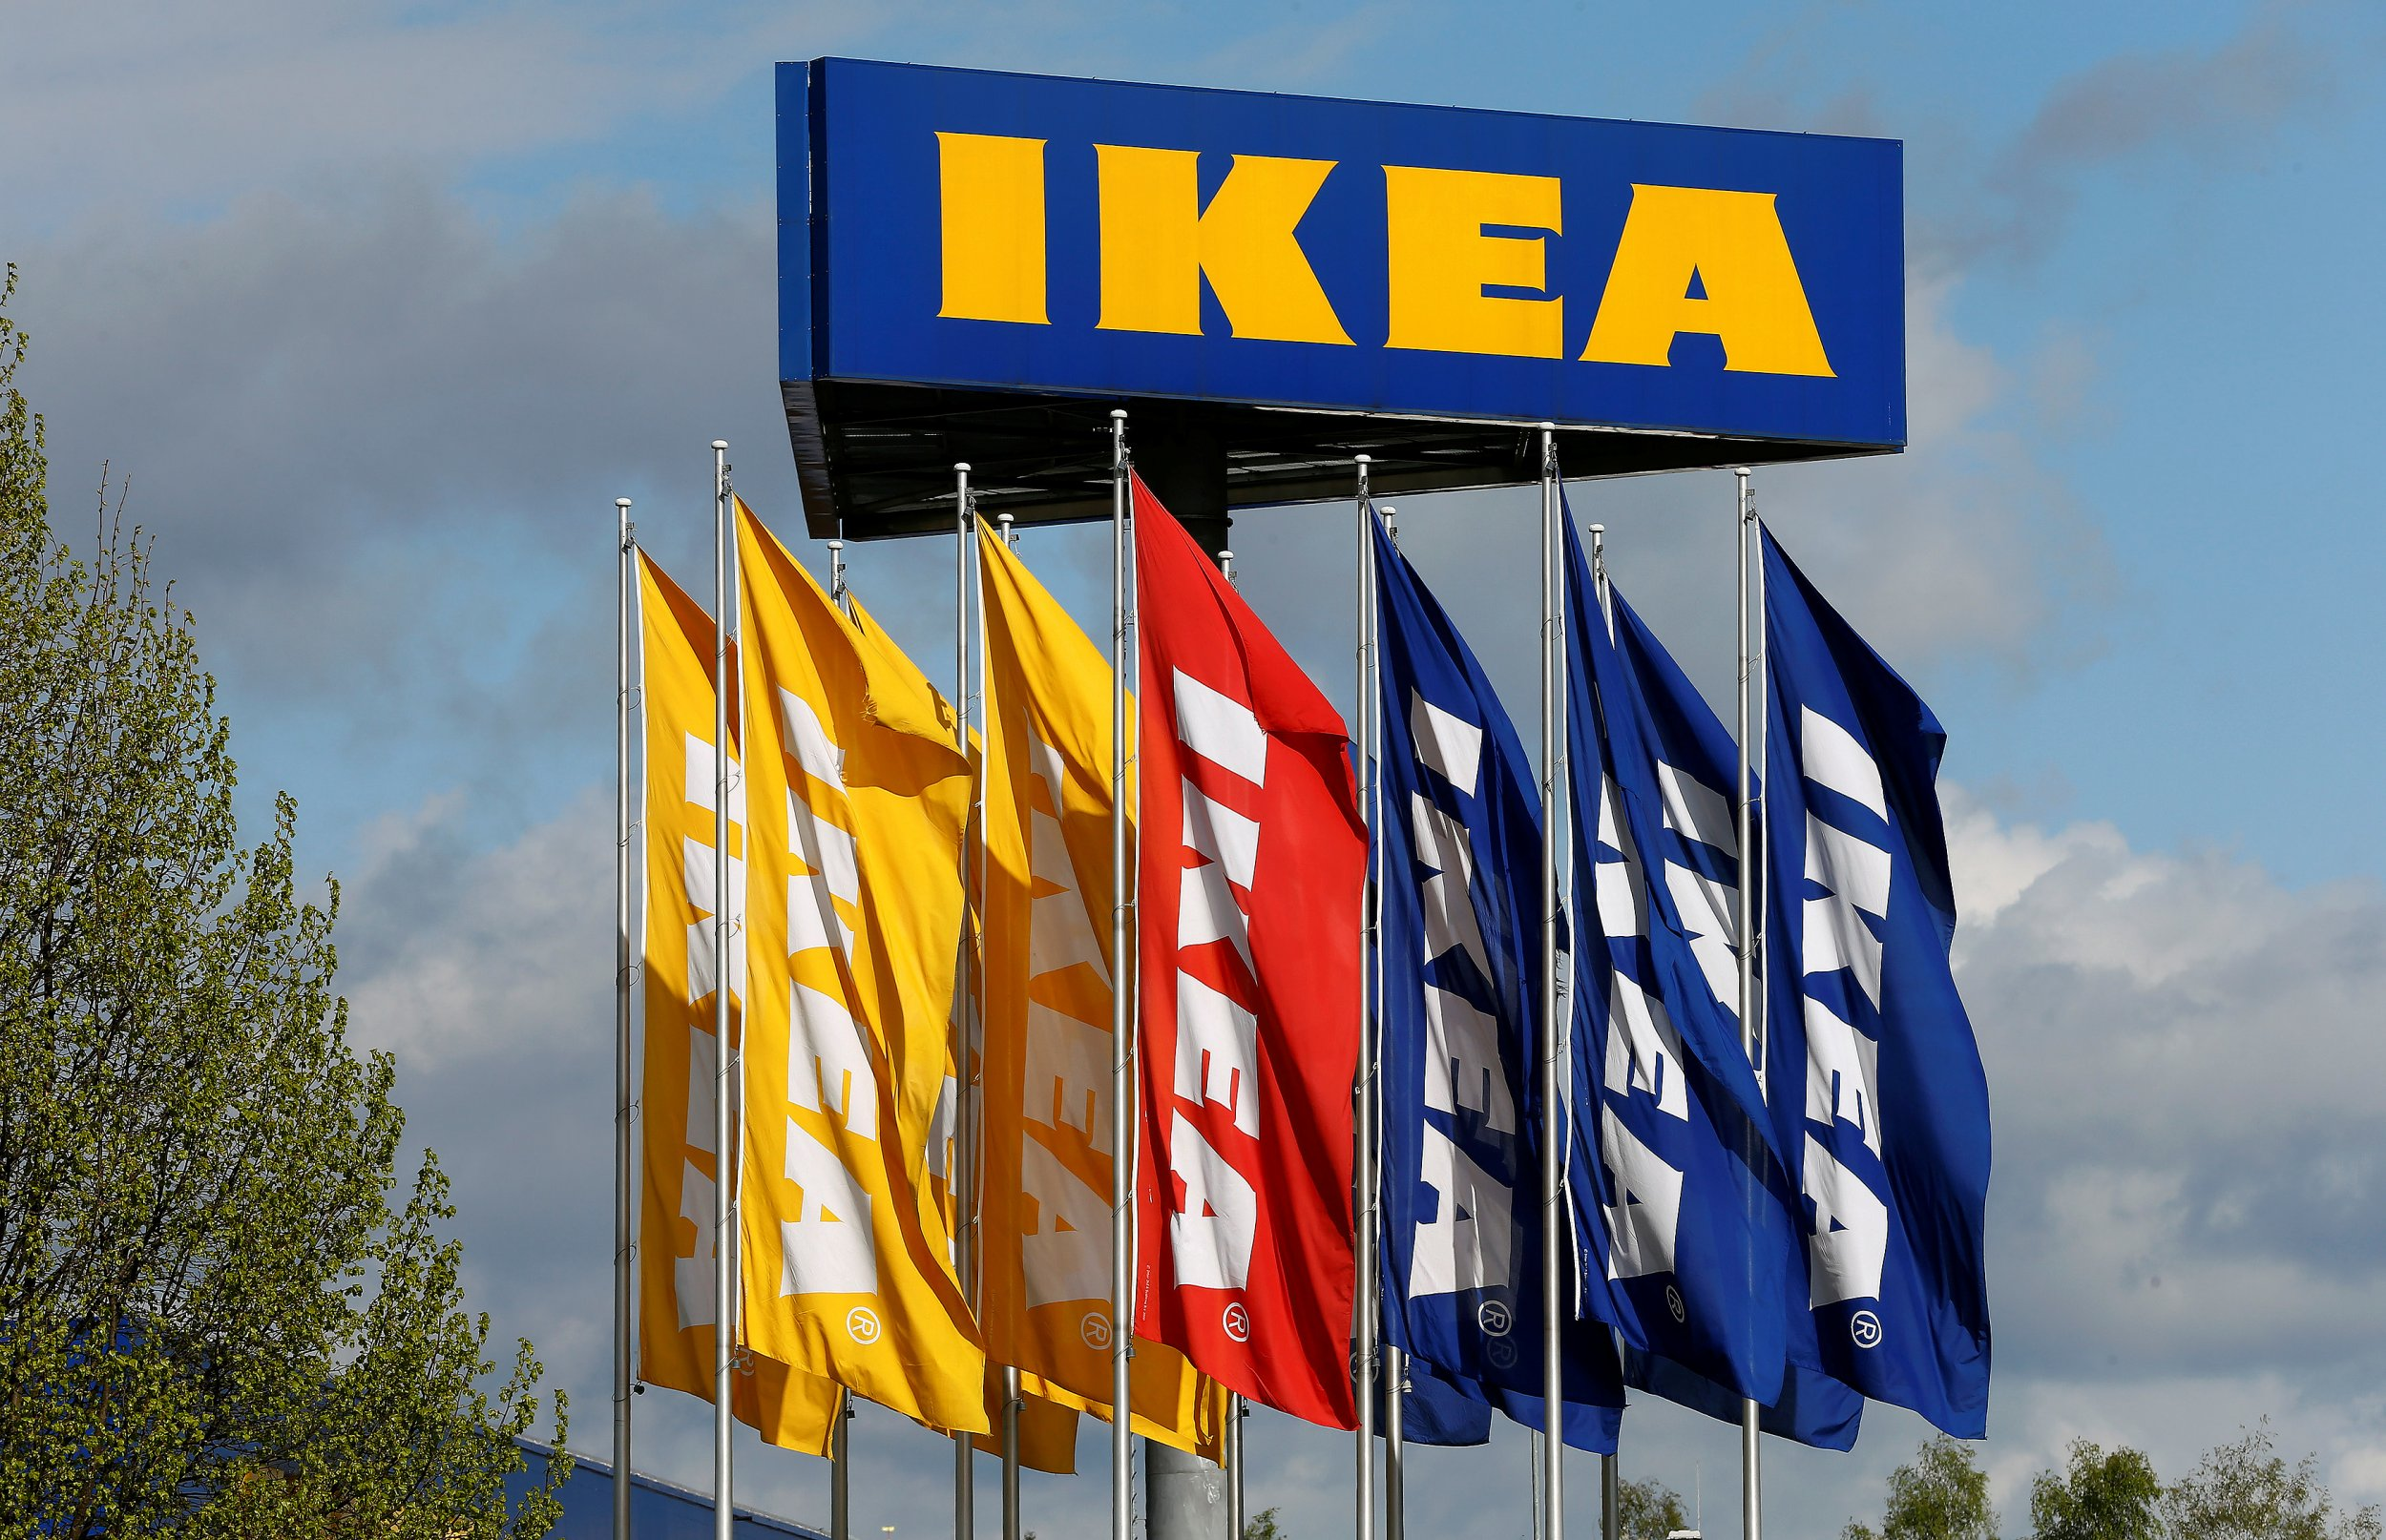 06_28_Ikea_dressers_01